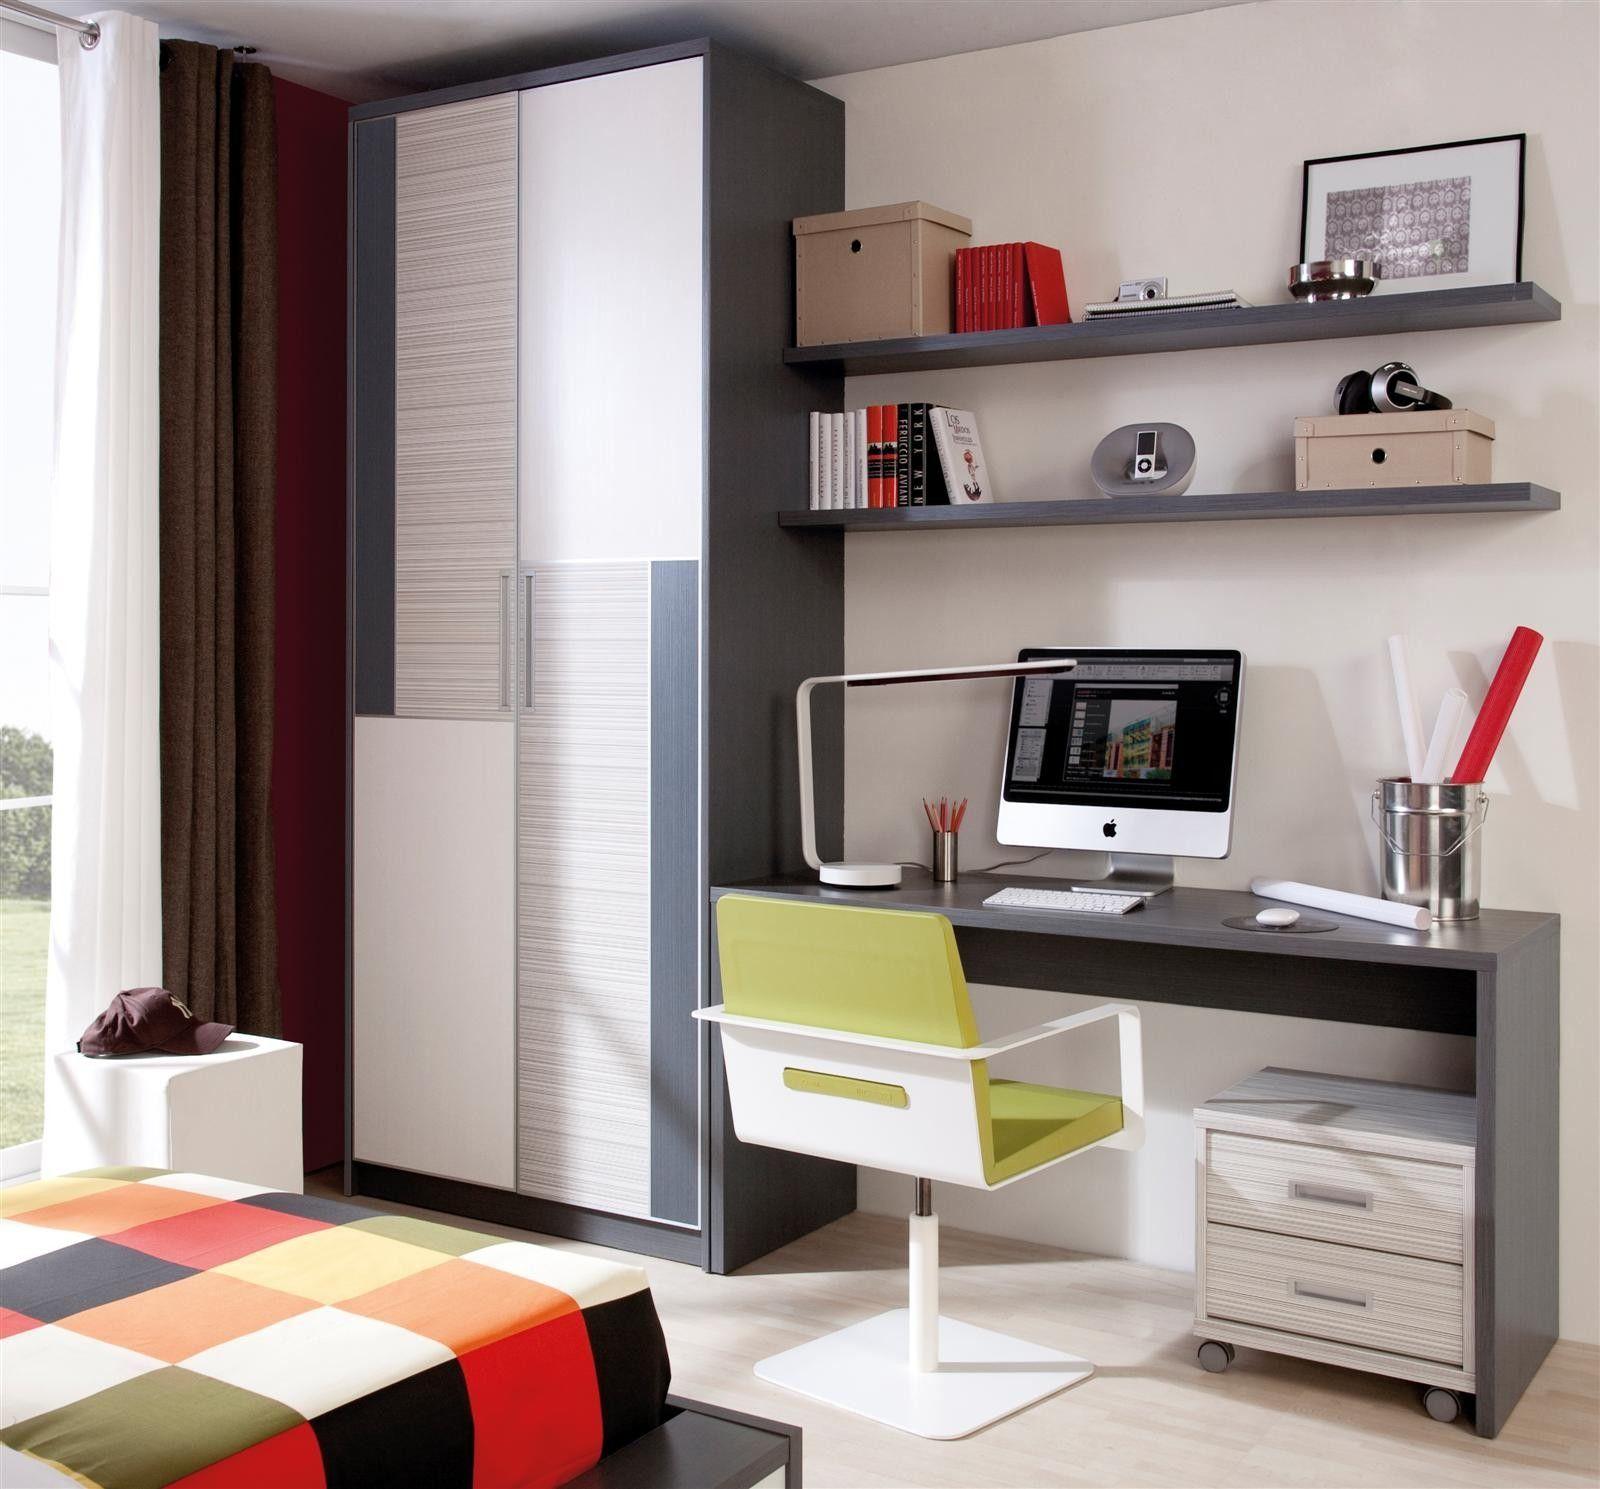 Custom modular units from Versa Style Design